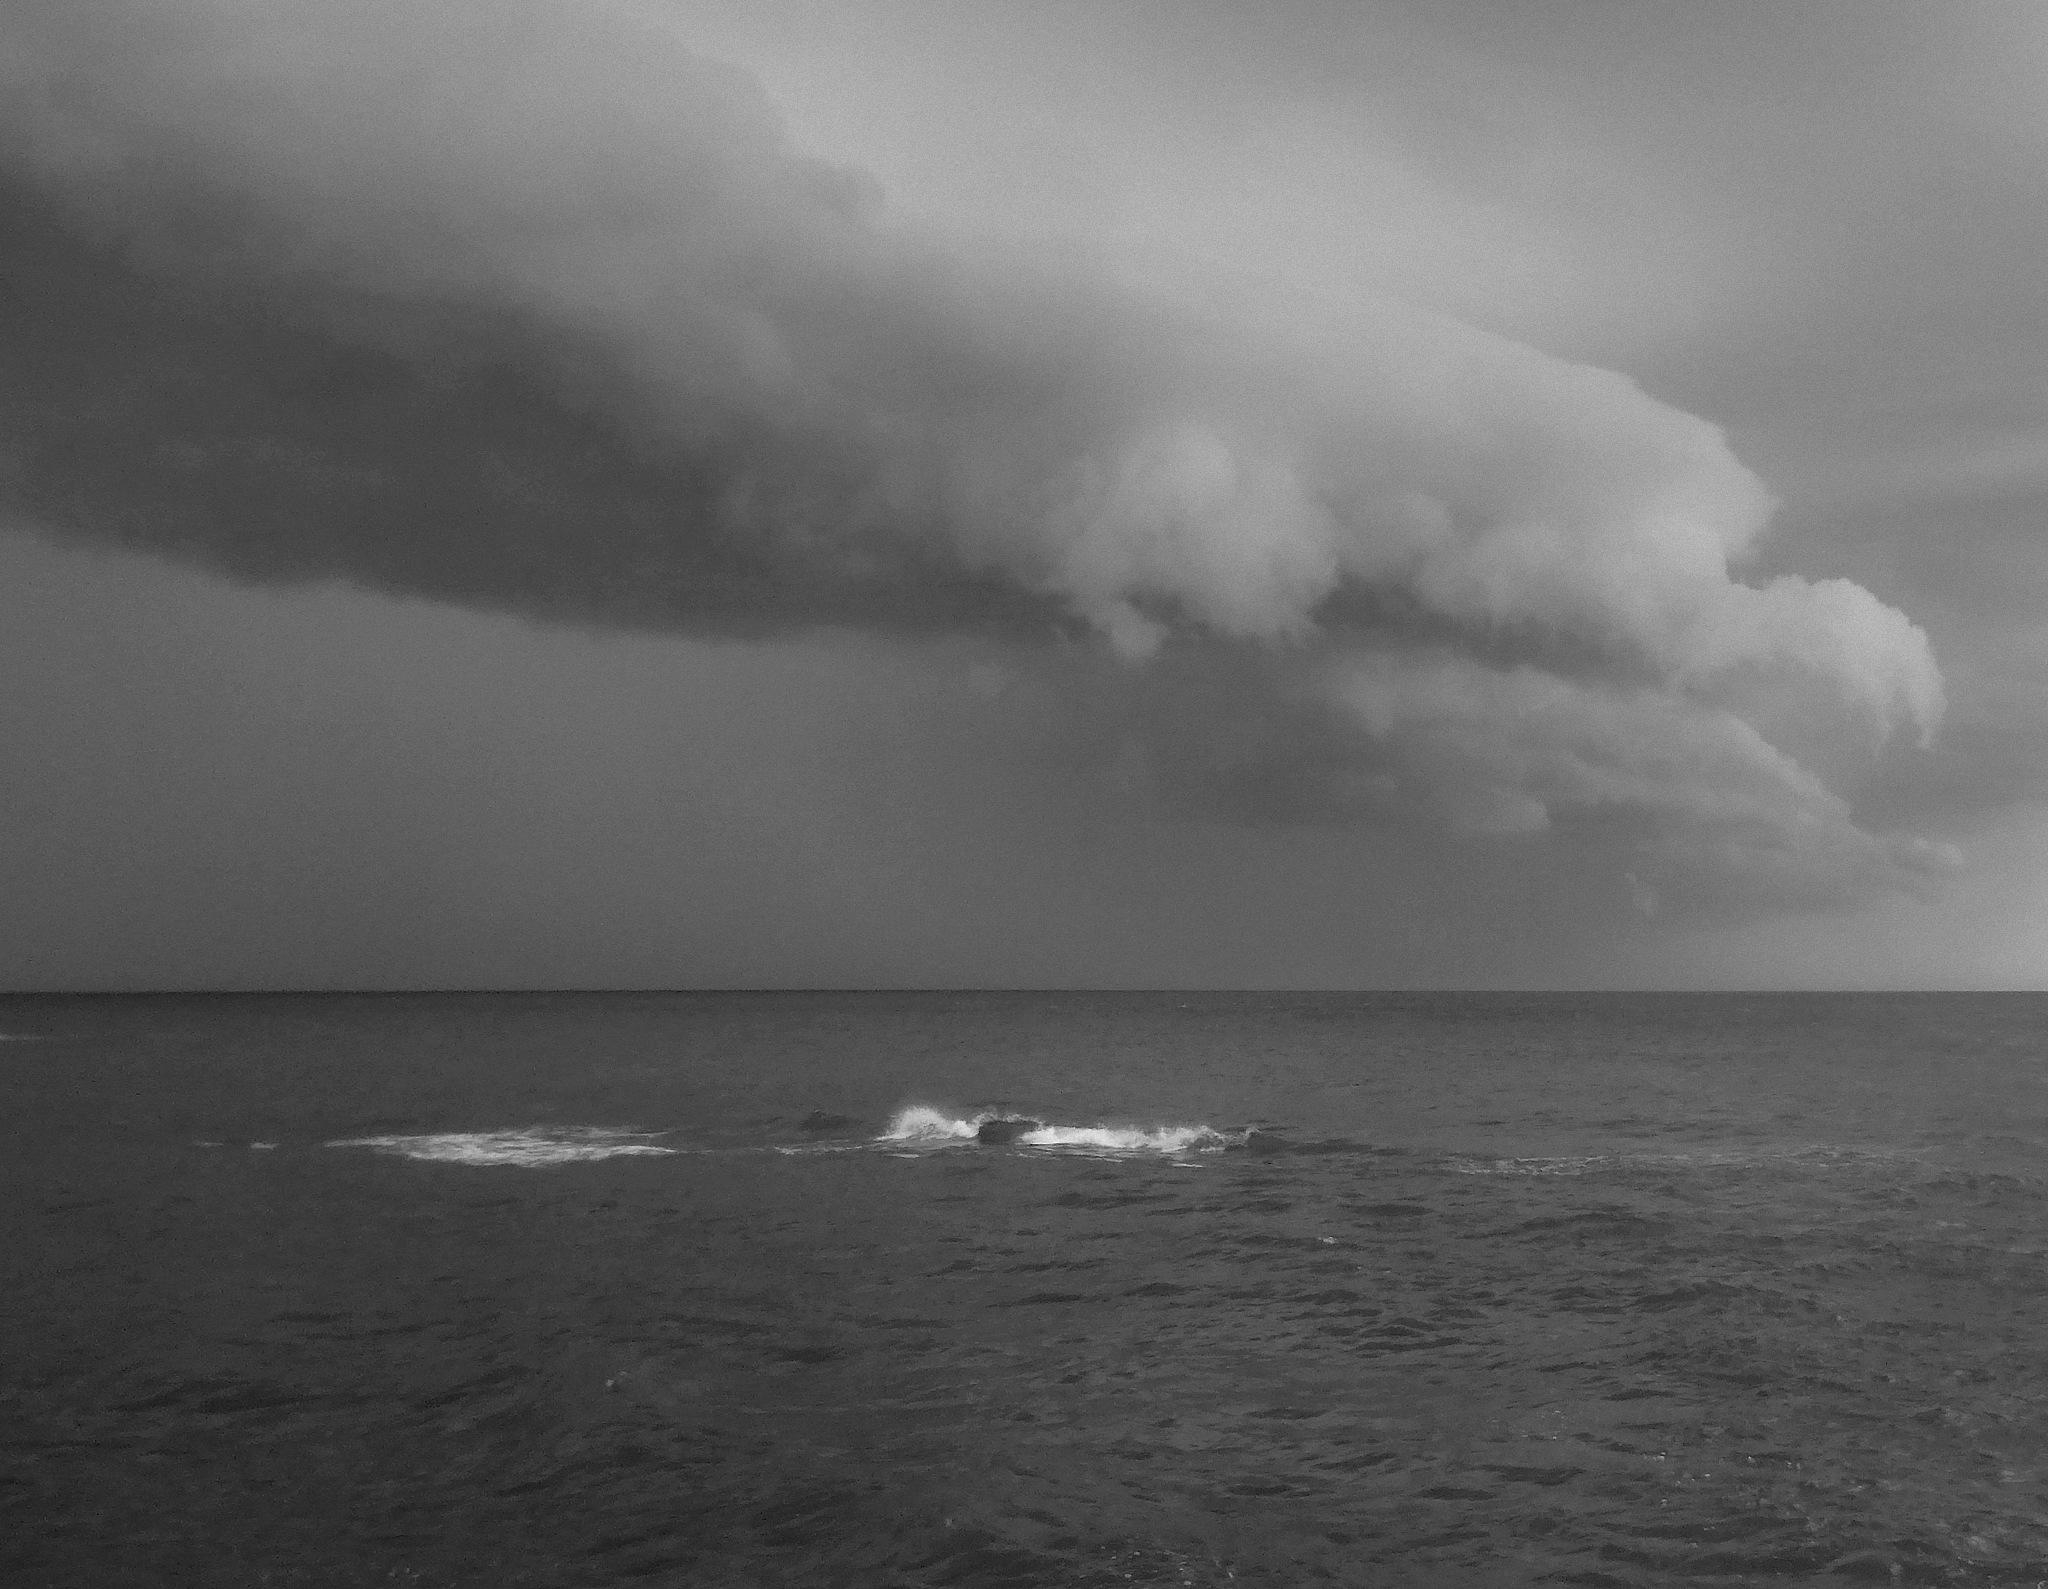 Untitled by Nicola Alocci